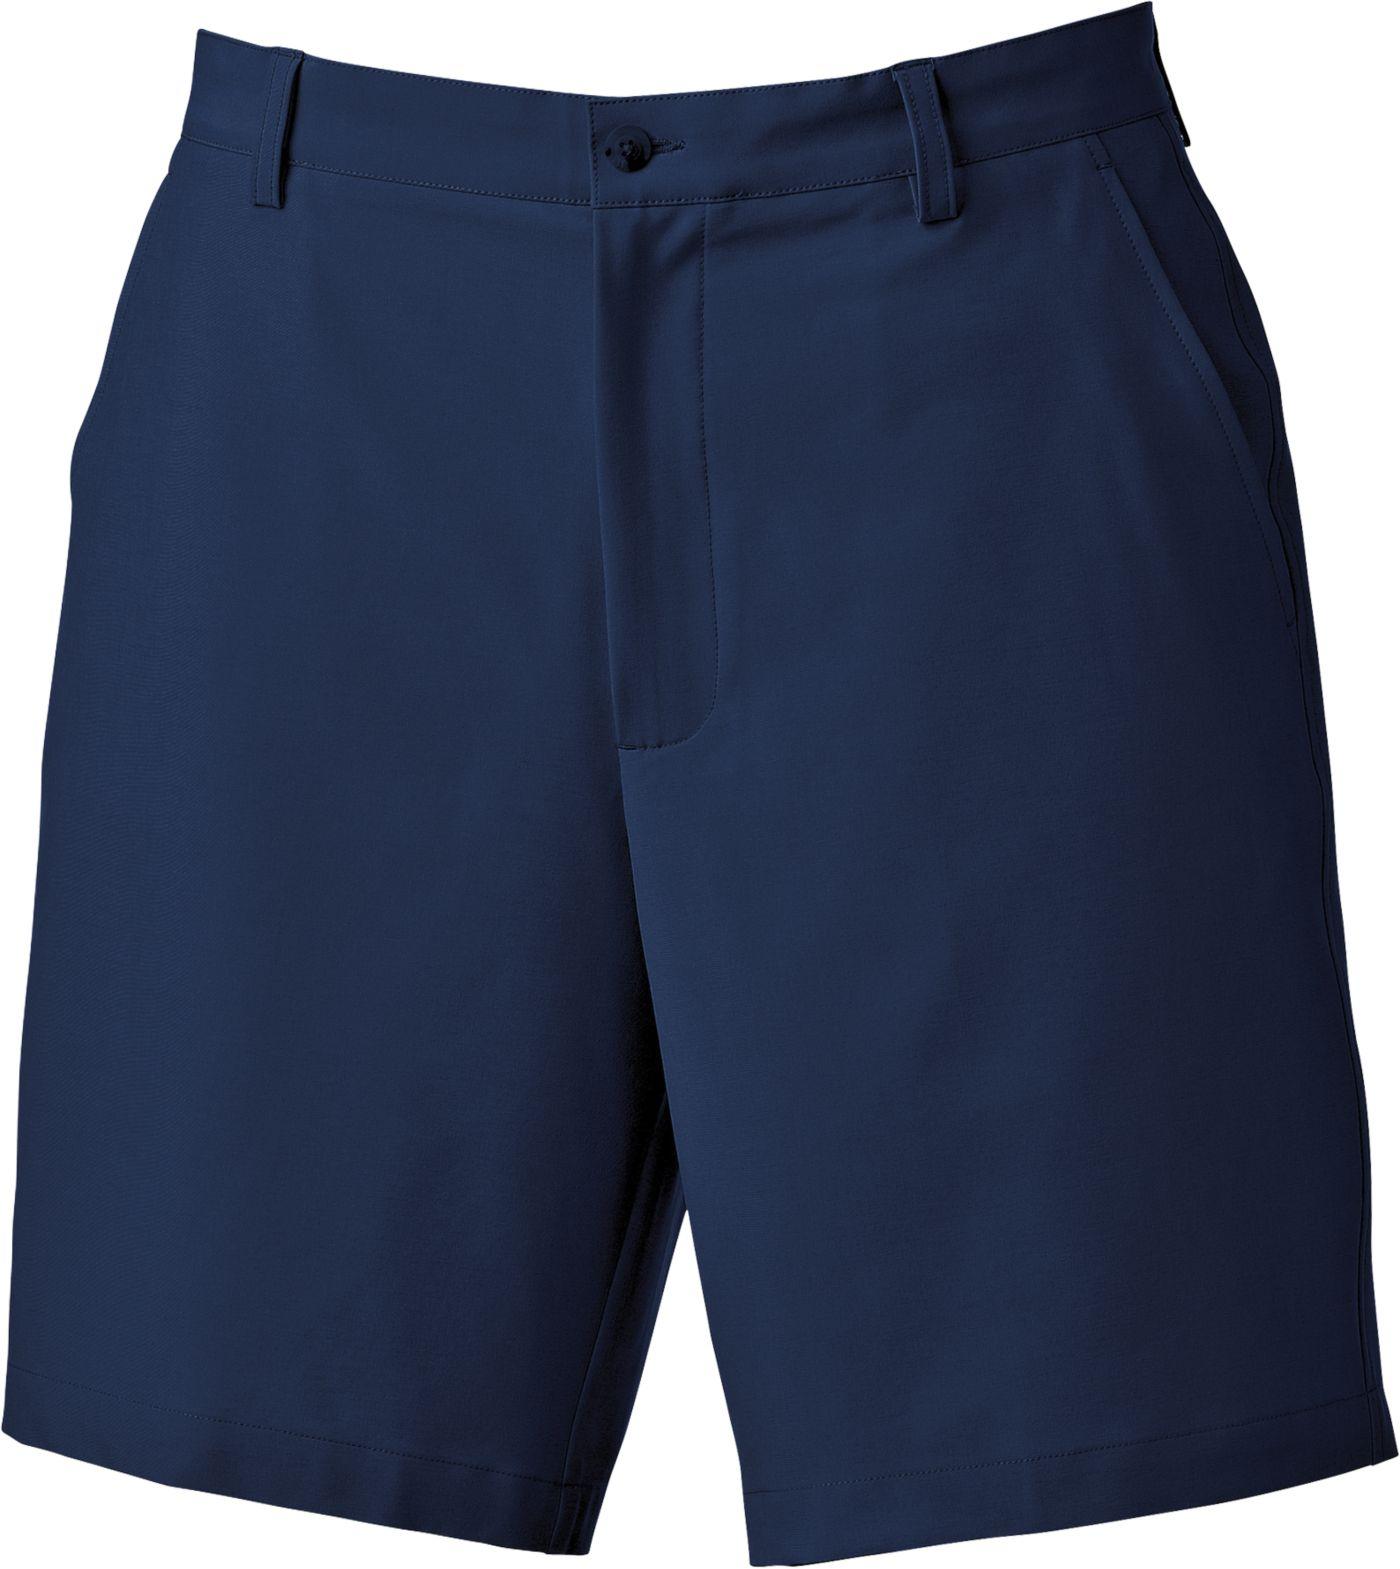 FootJoy Men's Performance Golf Shorts